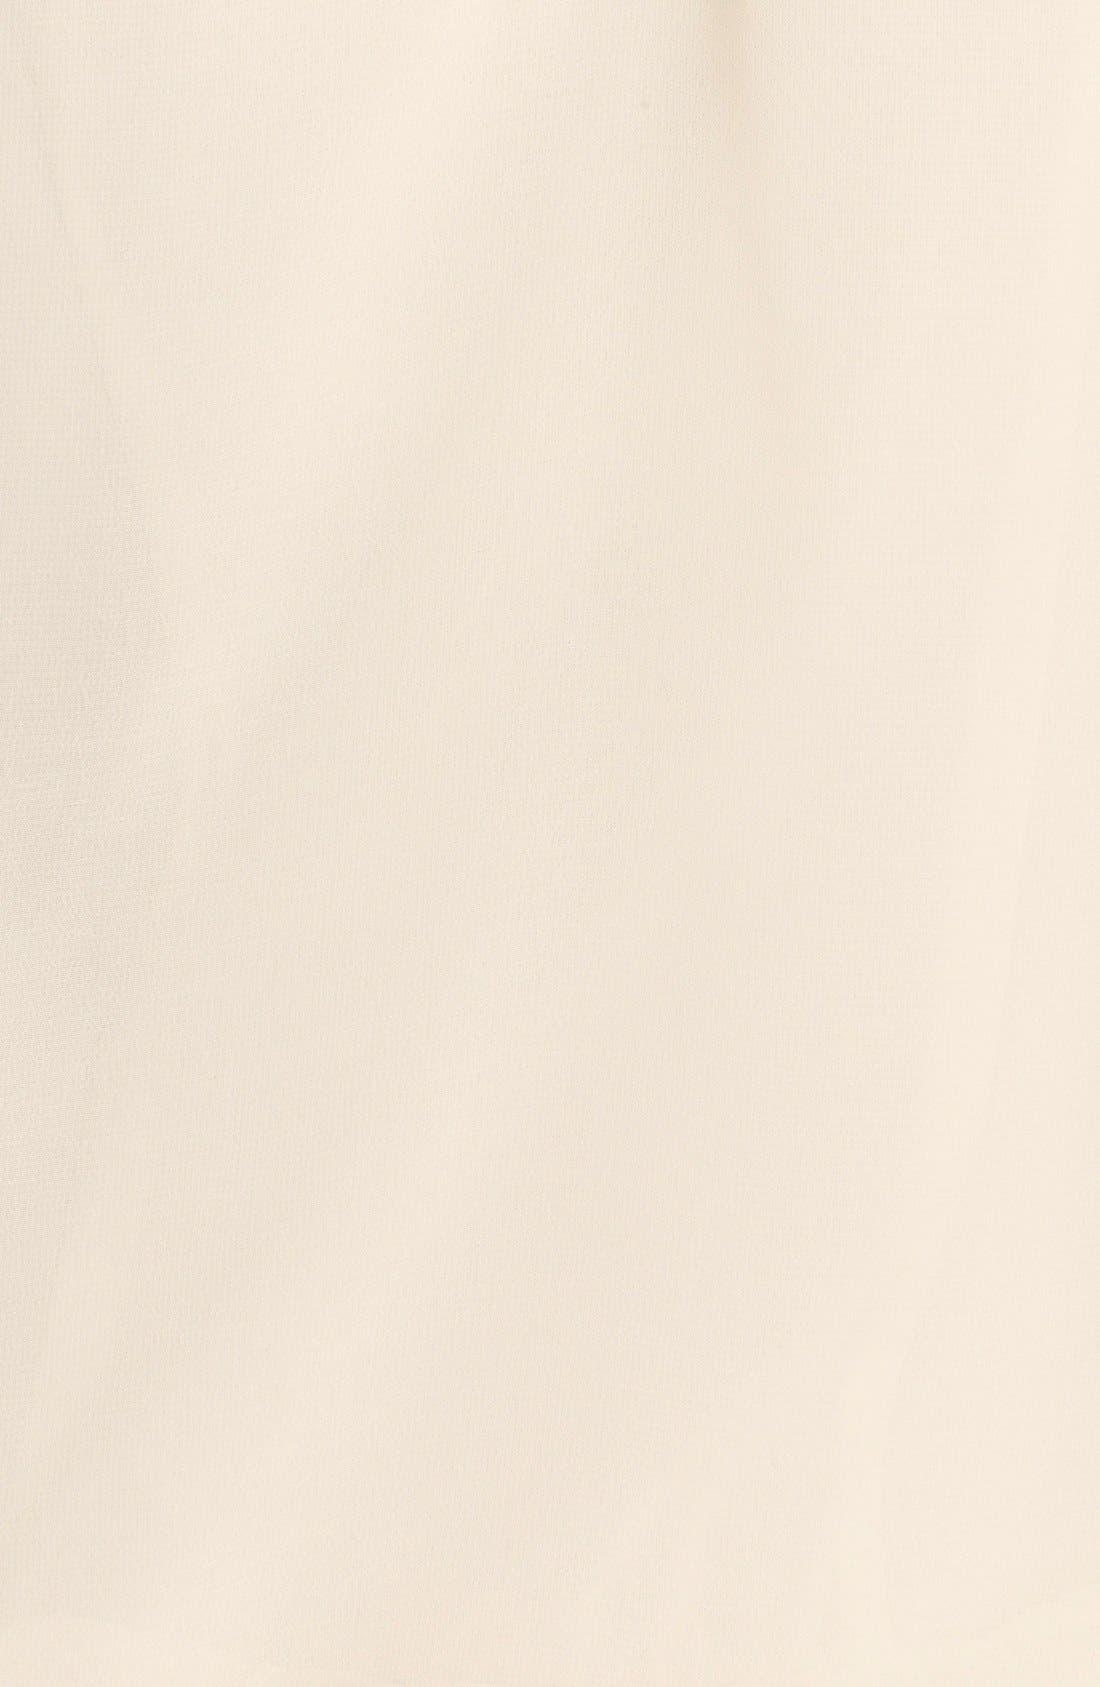 Alternate Image 3  - Aidan Mattox Embellished Blouson Dress (Online Only)